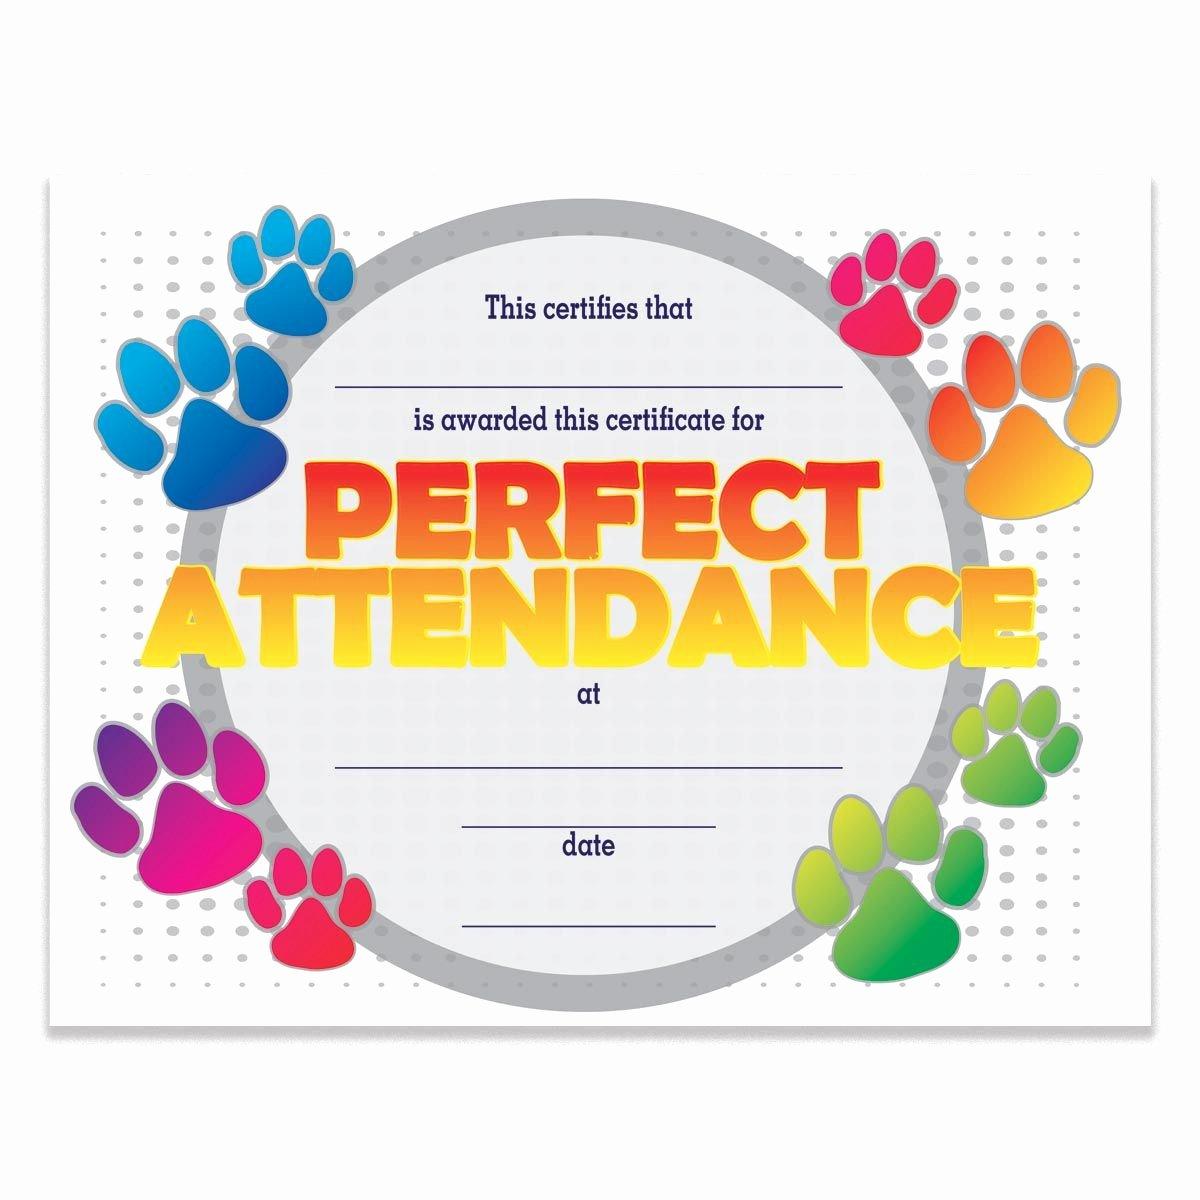 Perfect attendance Award Certificate Inspirational Paw Perfect attendance Certificates Pack